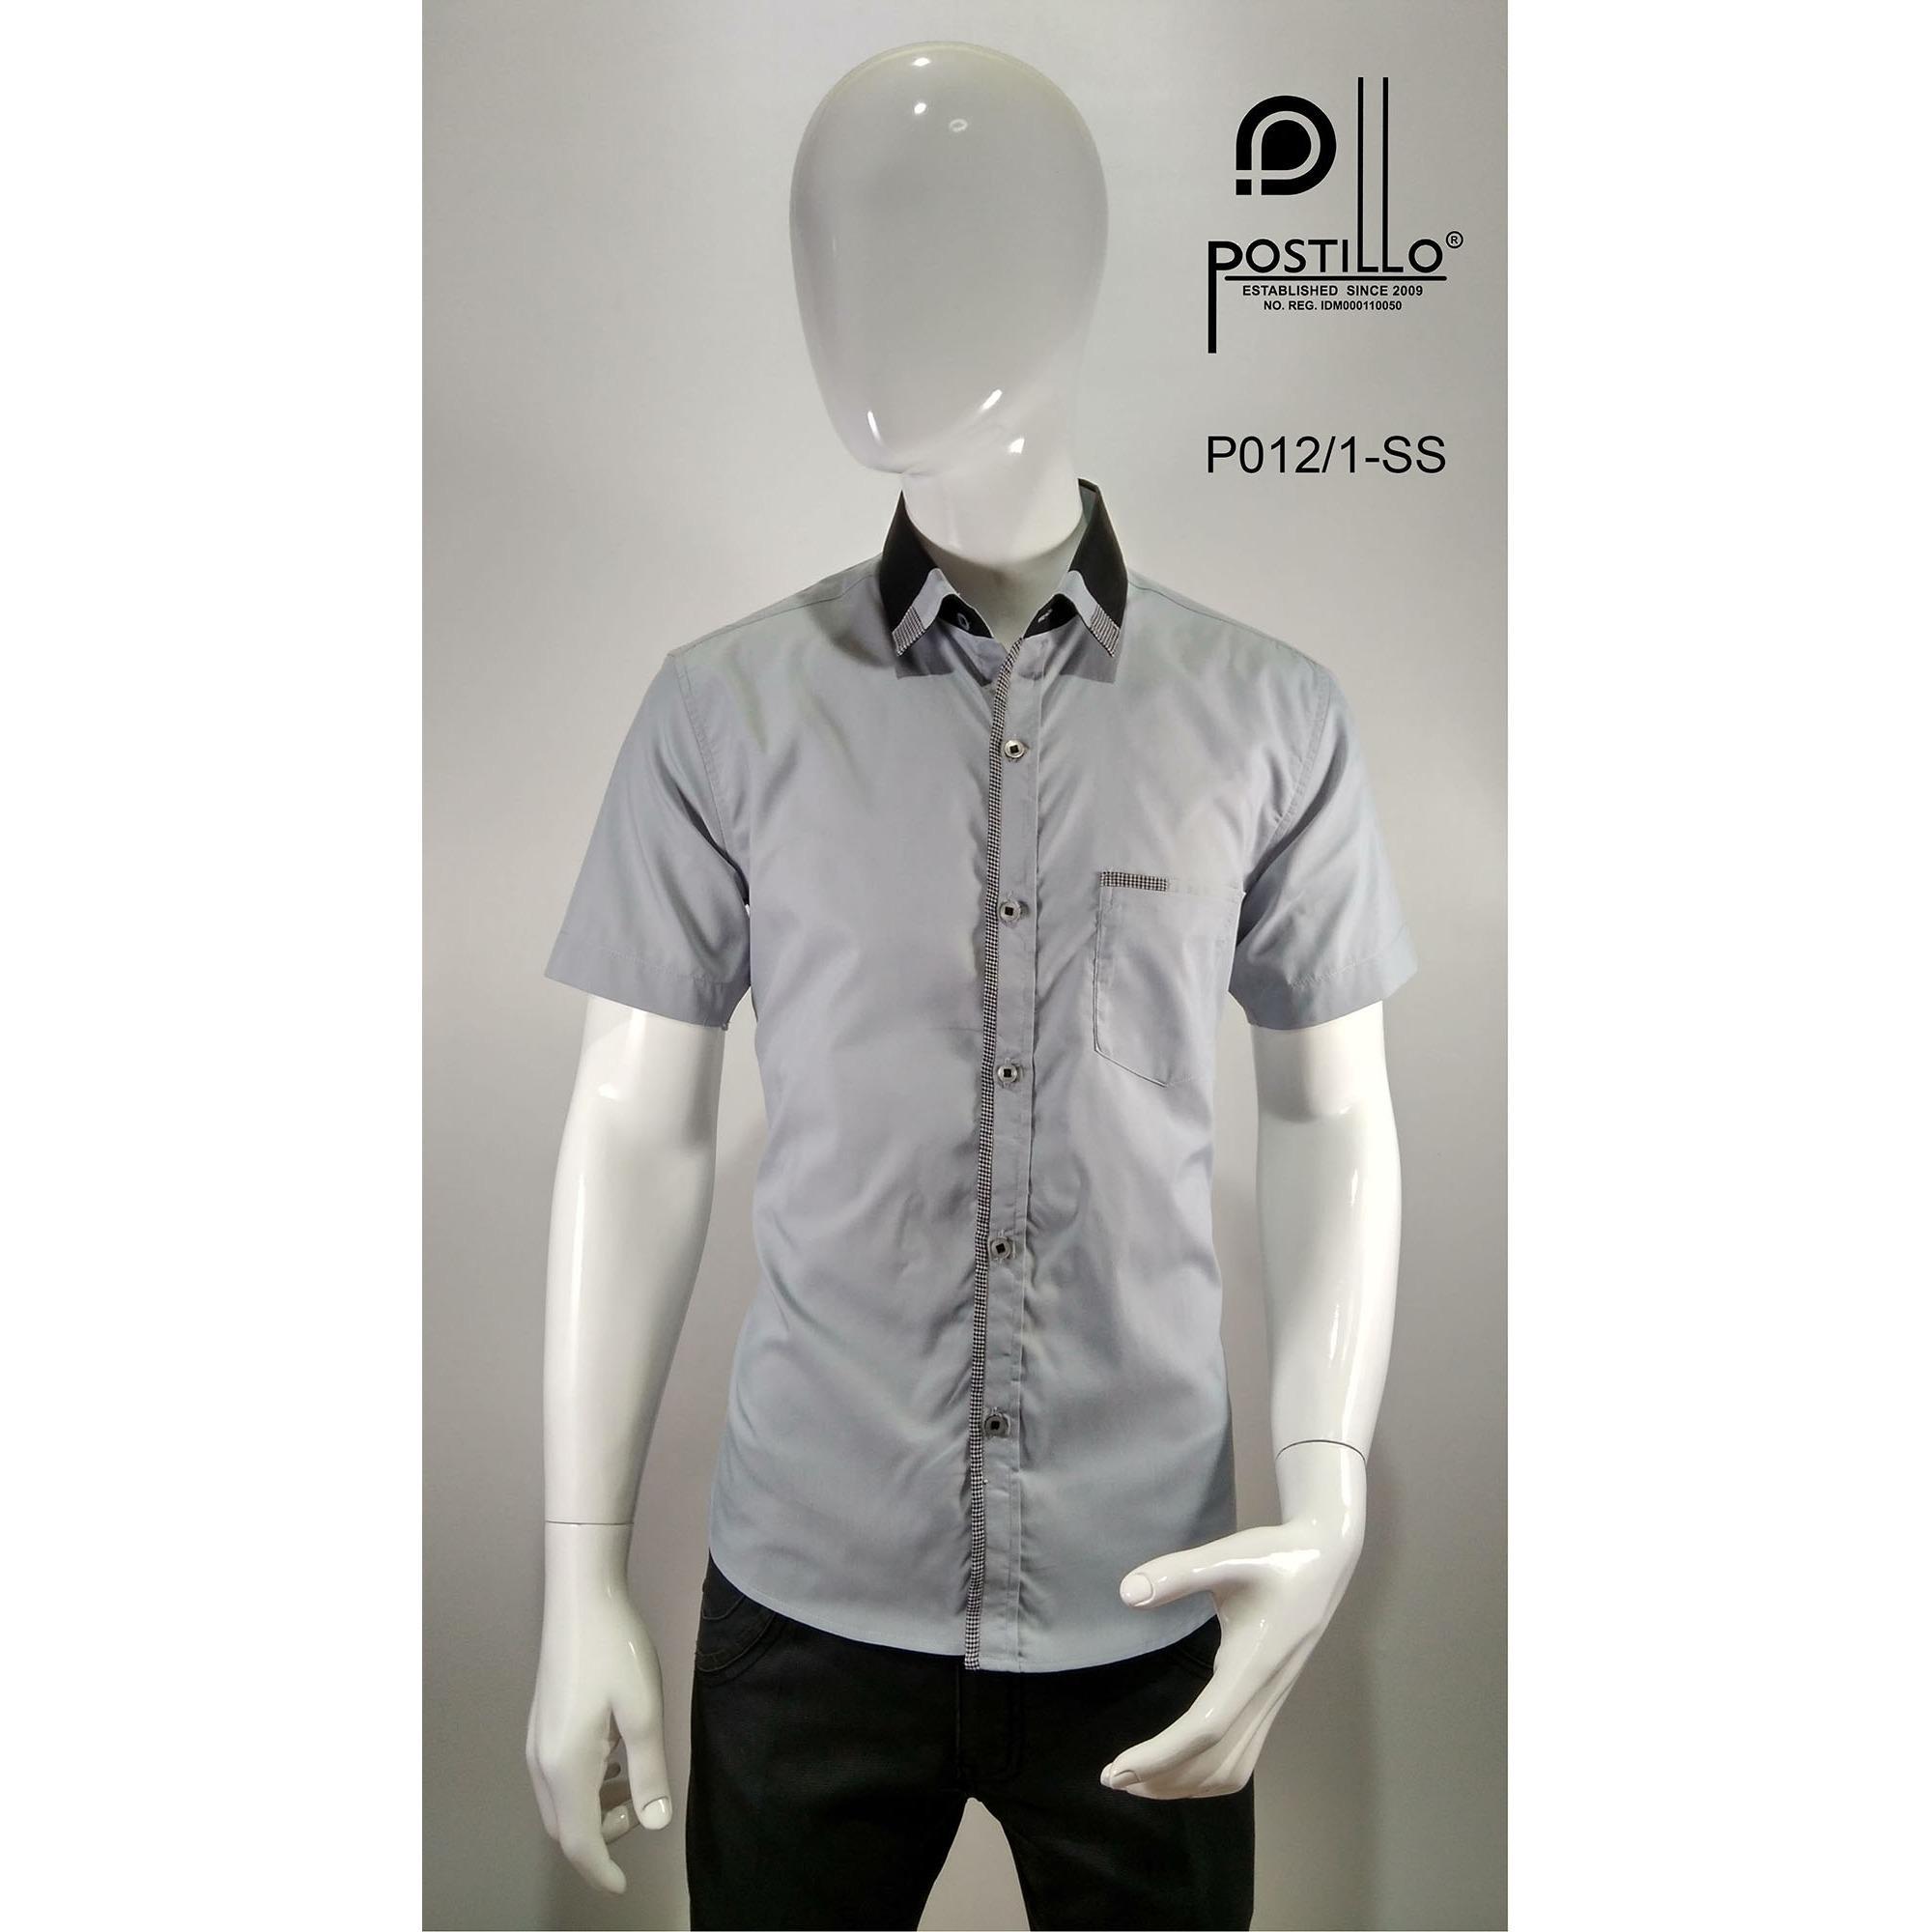 Kemeja Fashion Pria Slim Fit Postillo P012-1-SS